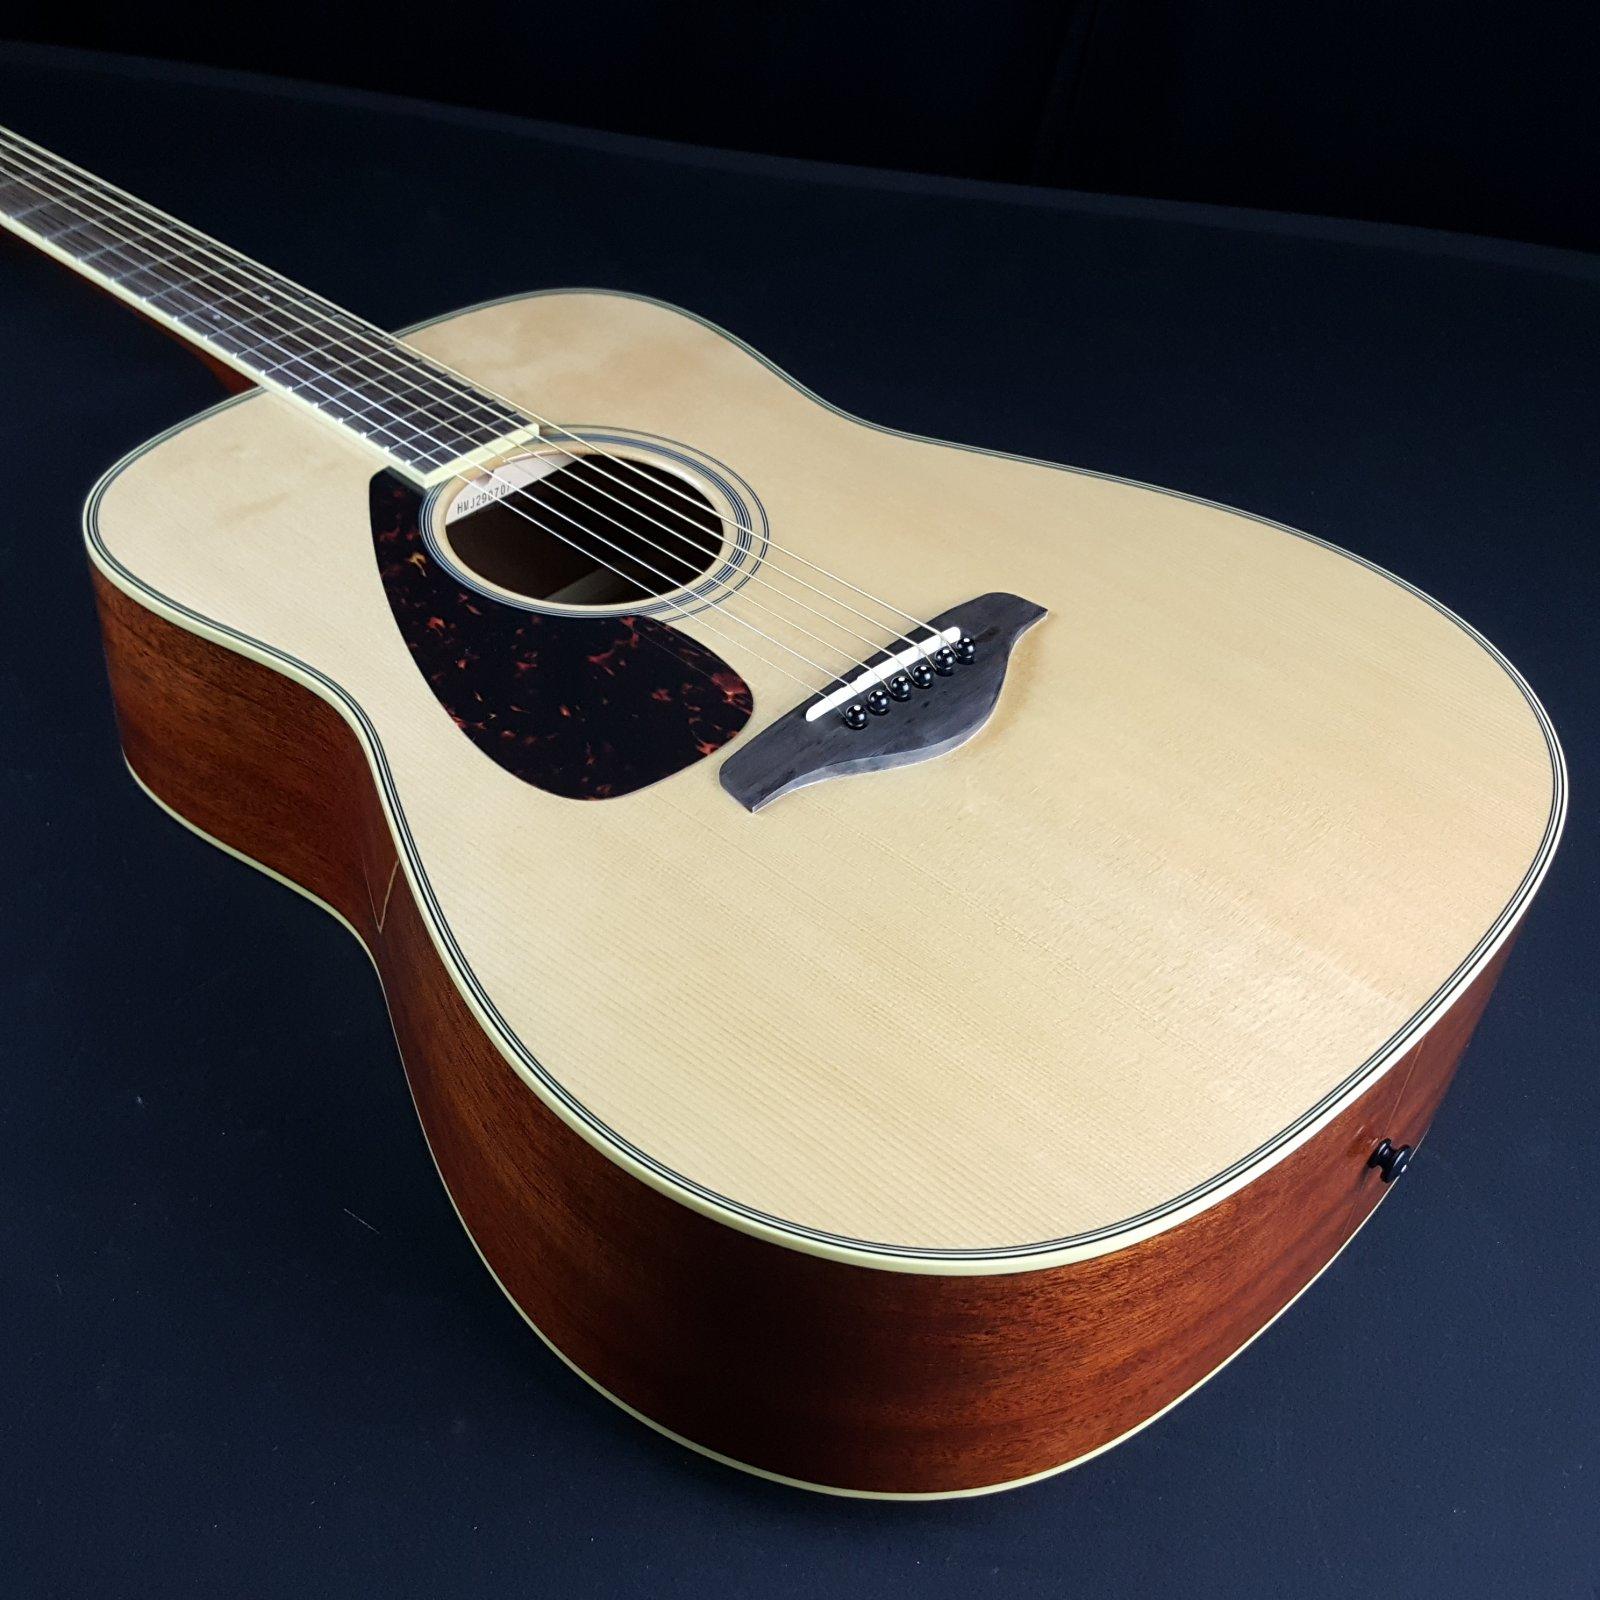 Yamaha FG820L Left Handed Spruce Top Acoustic Guitar